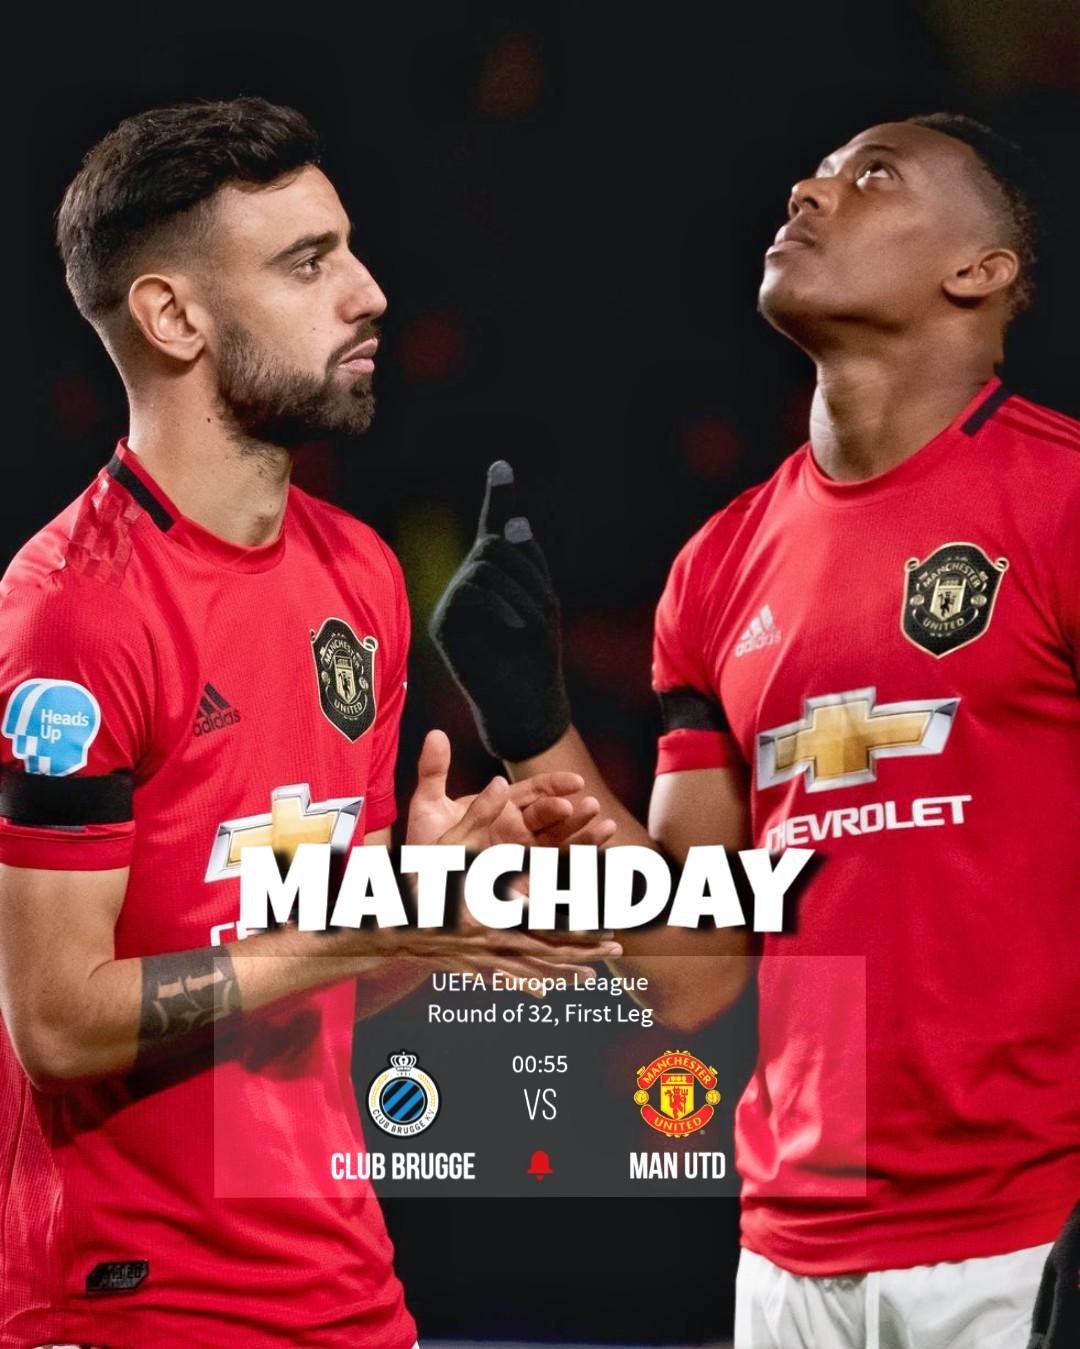 Manchester United vs. Club Brugge